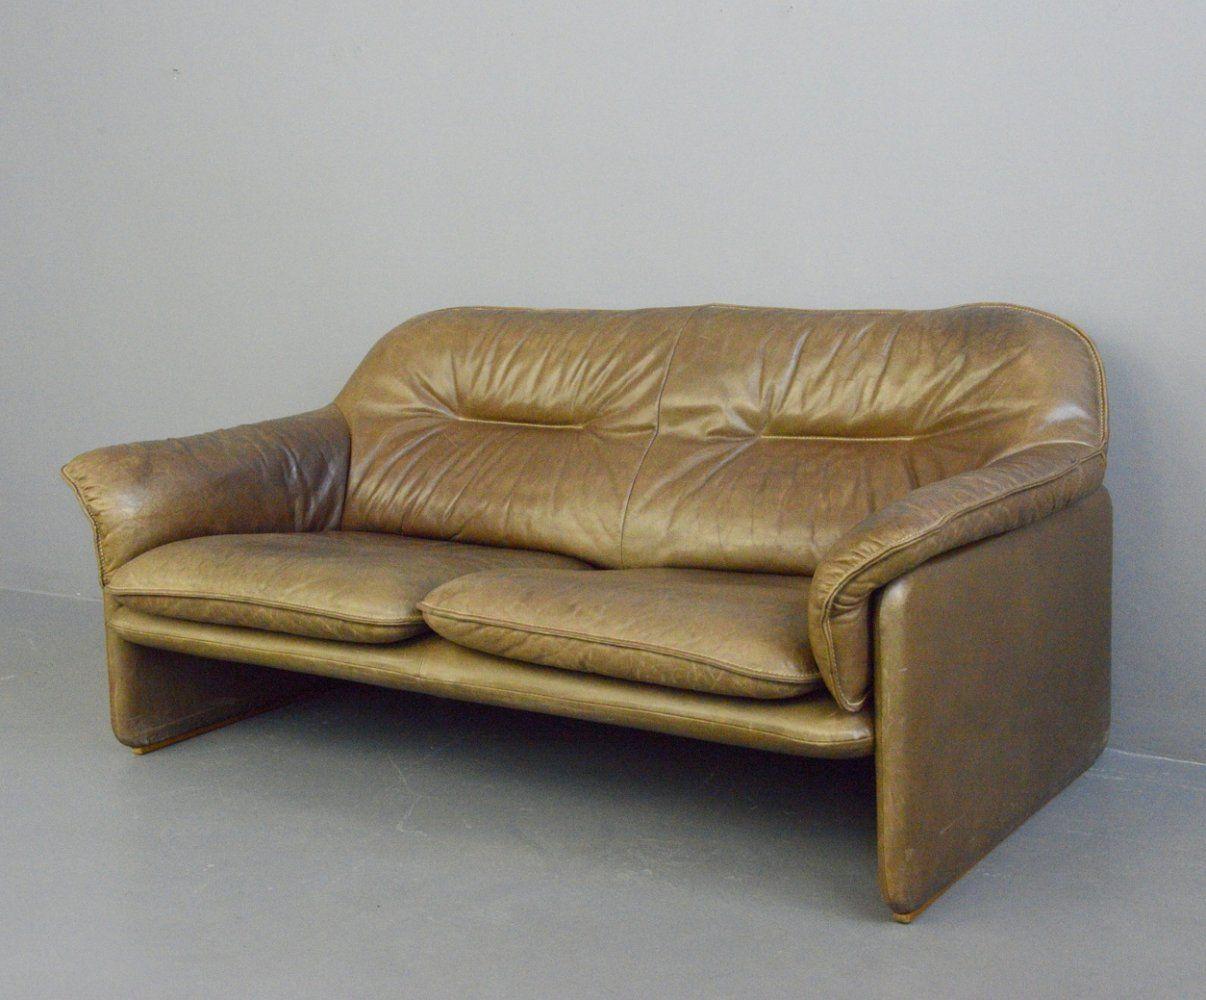 For Sale Mid Century Leather Sofa By De Sede Circa 1960s Vntg Vintage In 2020 Mid Century Leather Sofa Leather Sofa Sofa